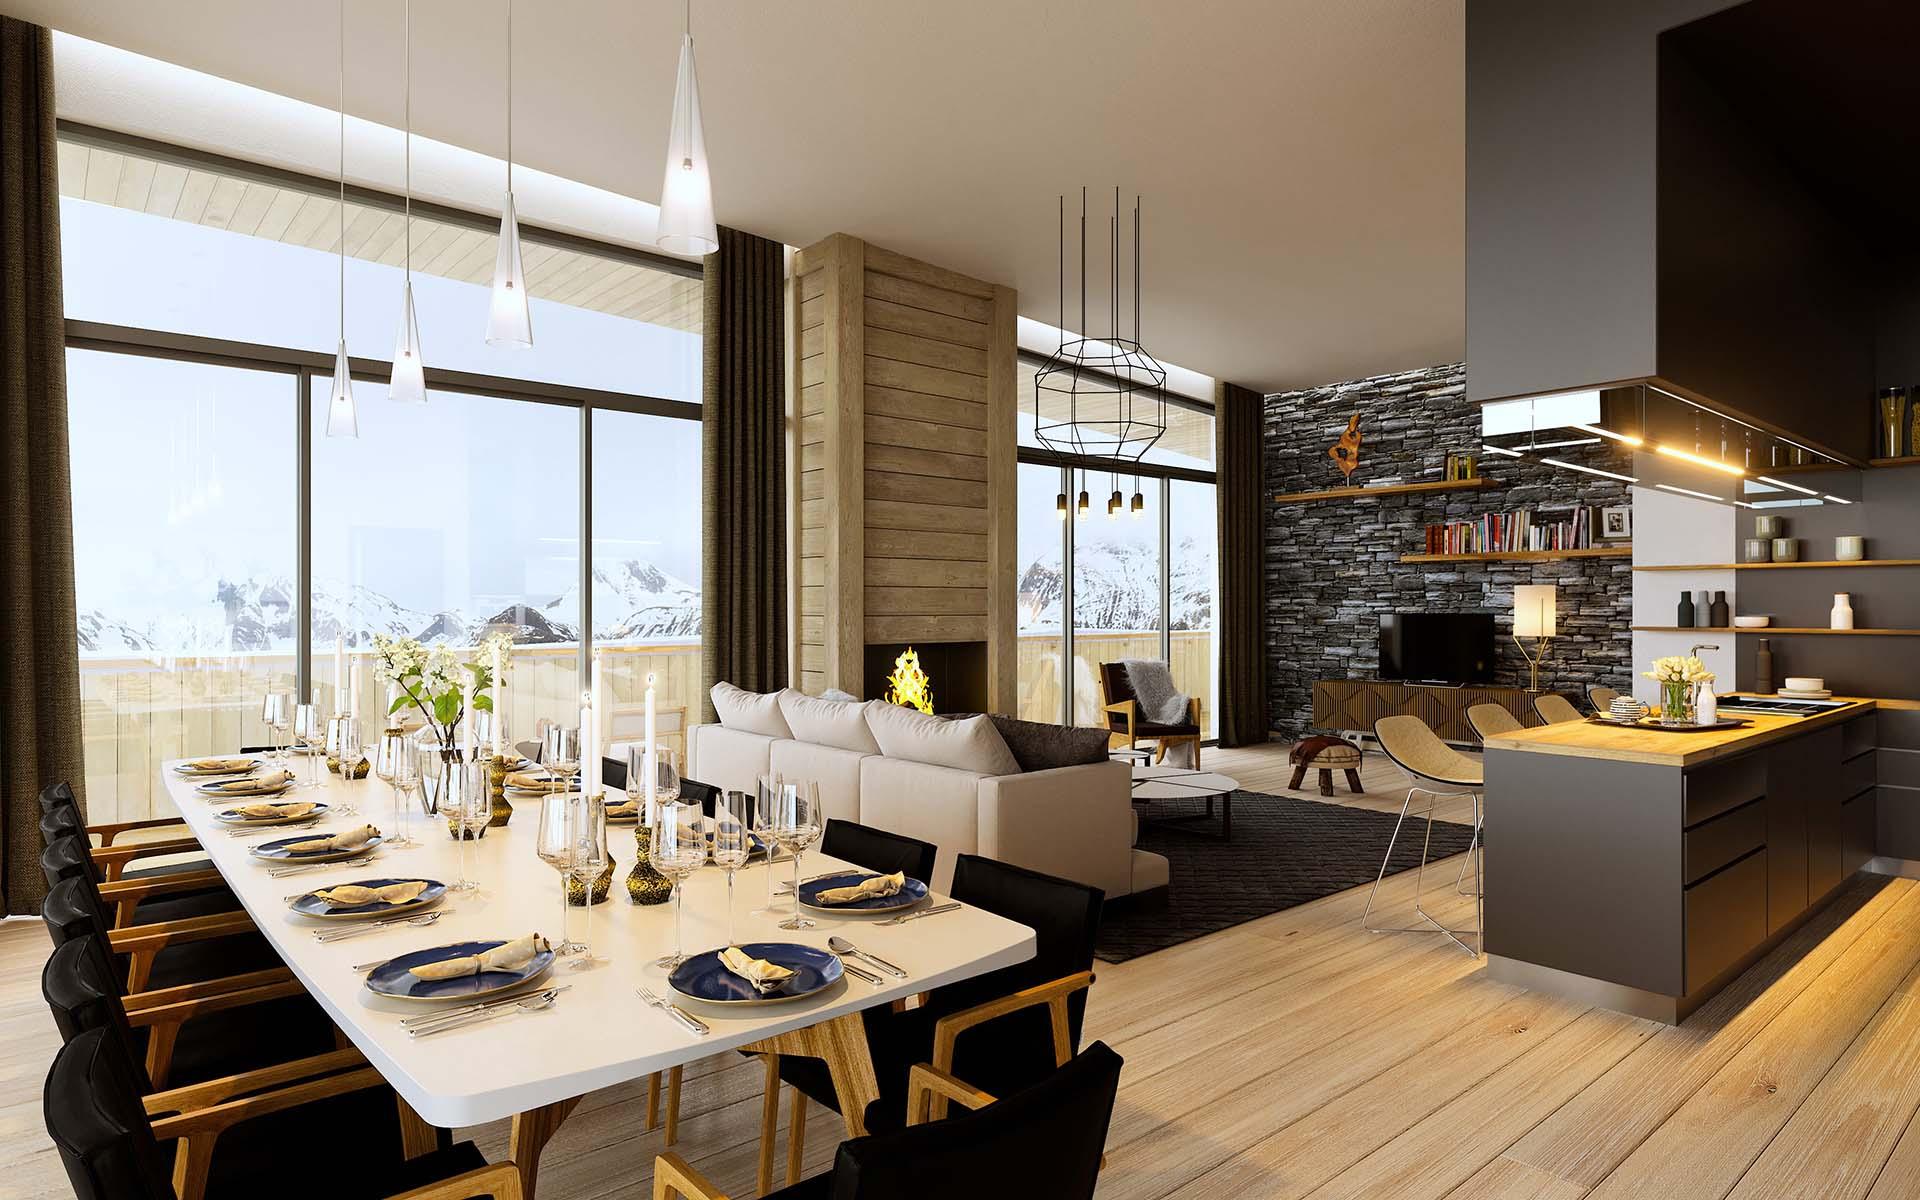 graphisme 3d vue en perspective salon luxe. Black Bedroom Furniture Sets. Home Design Ideas